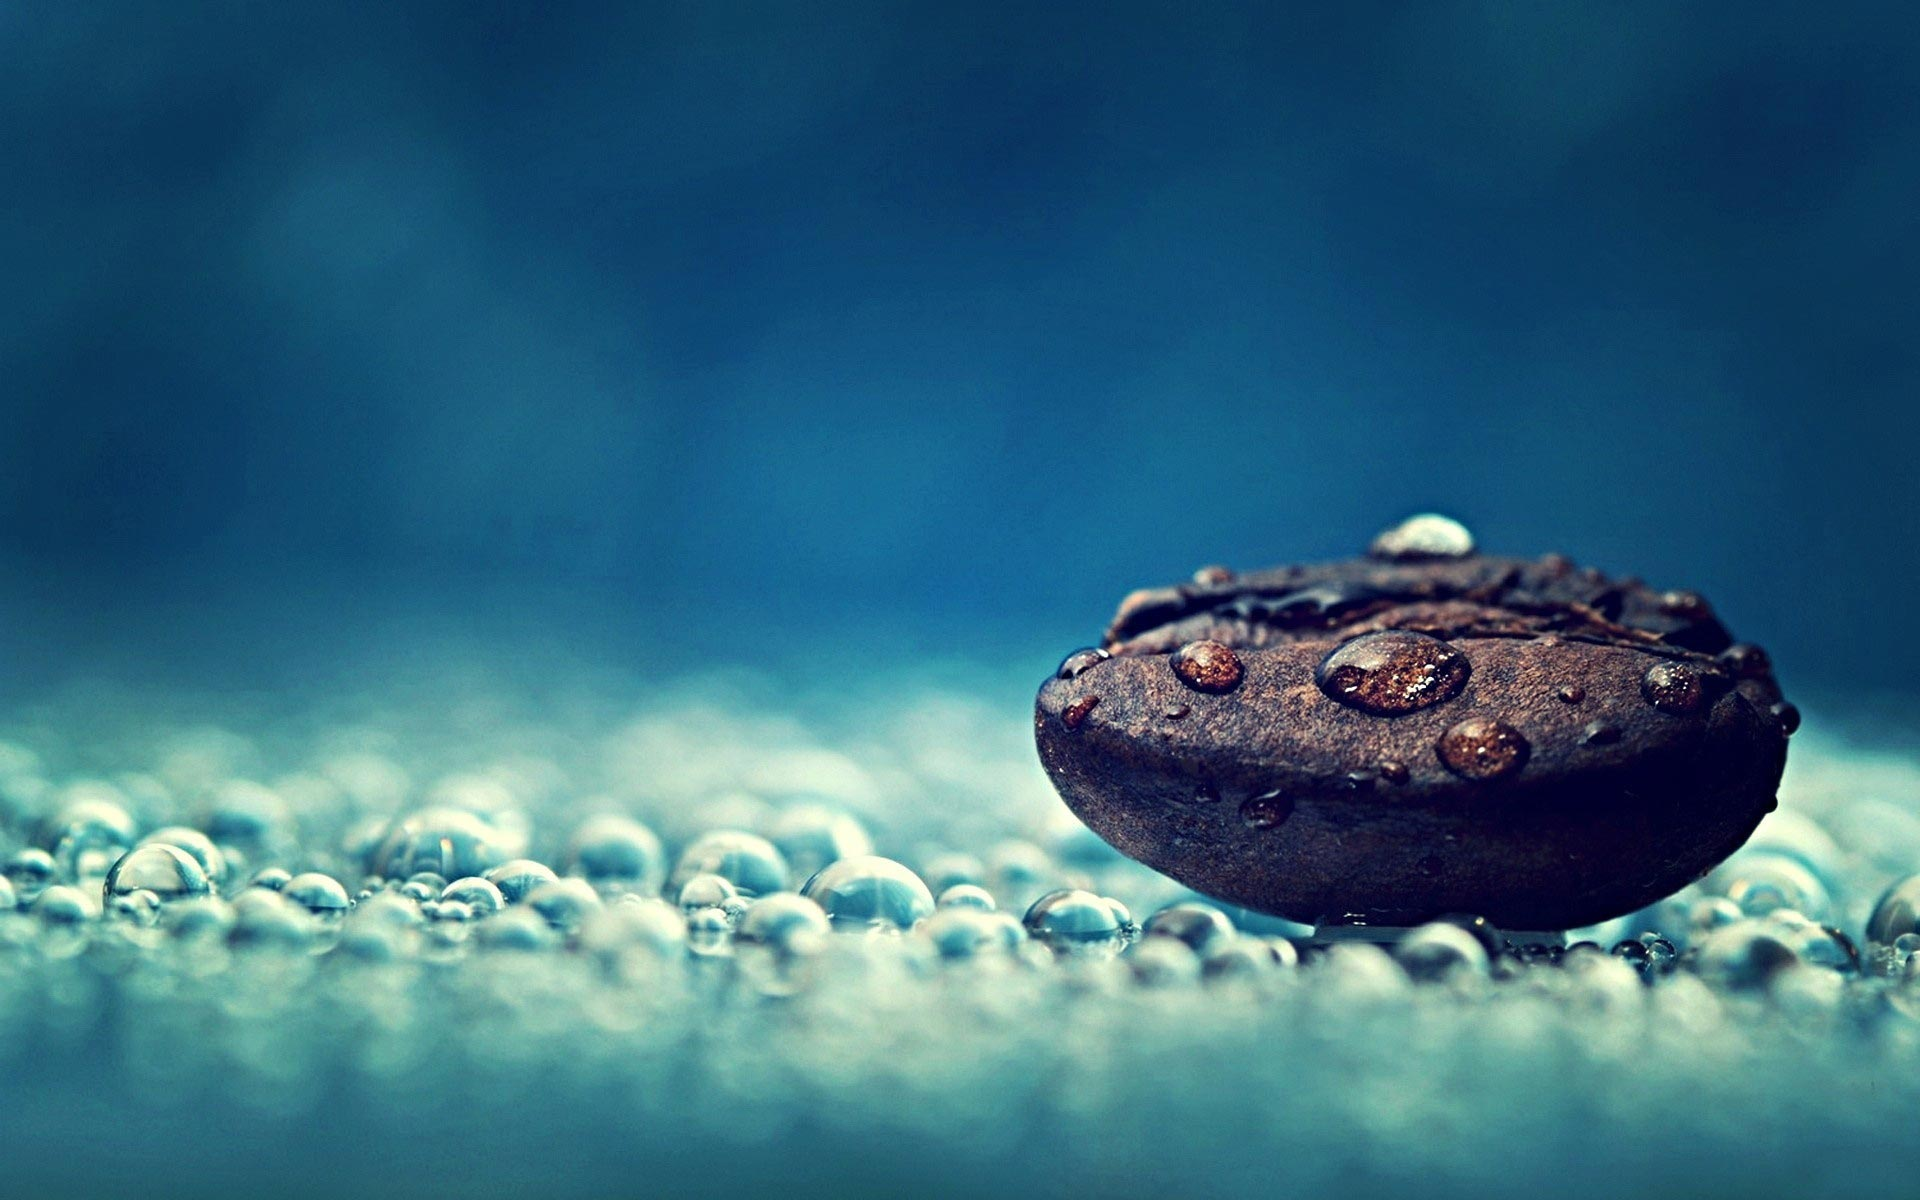 Droplet On Pebble